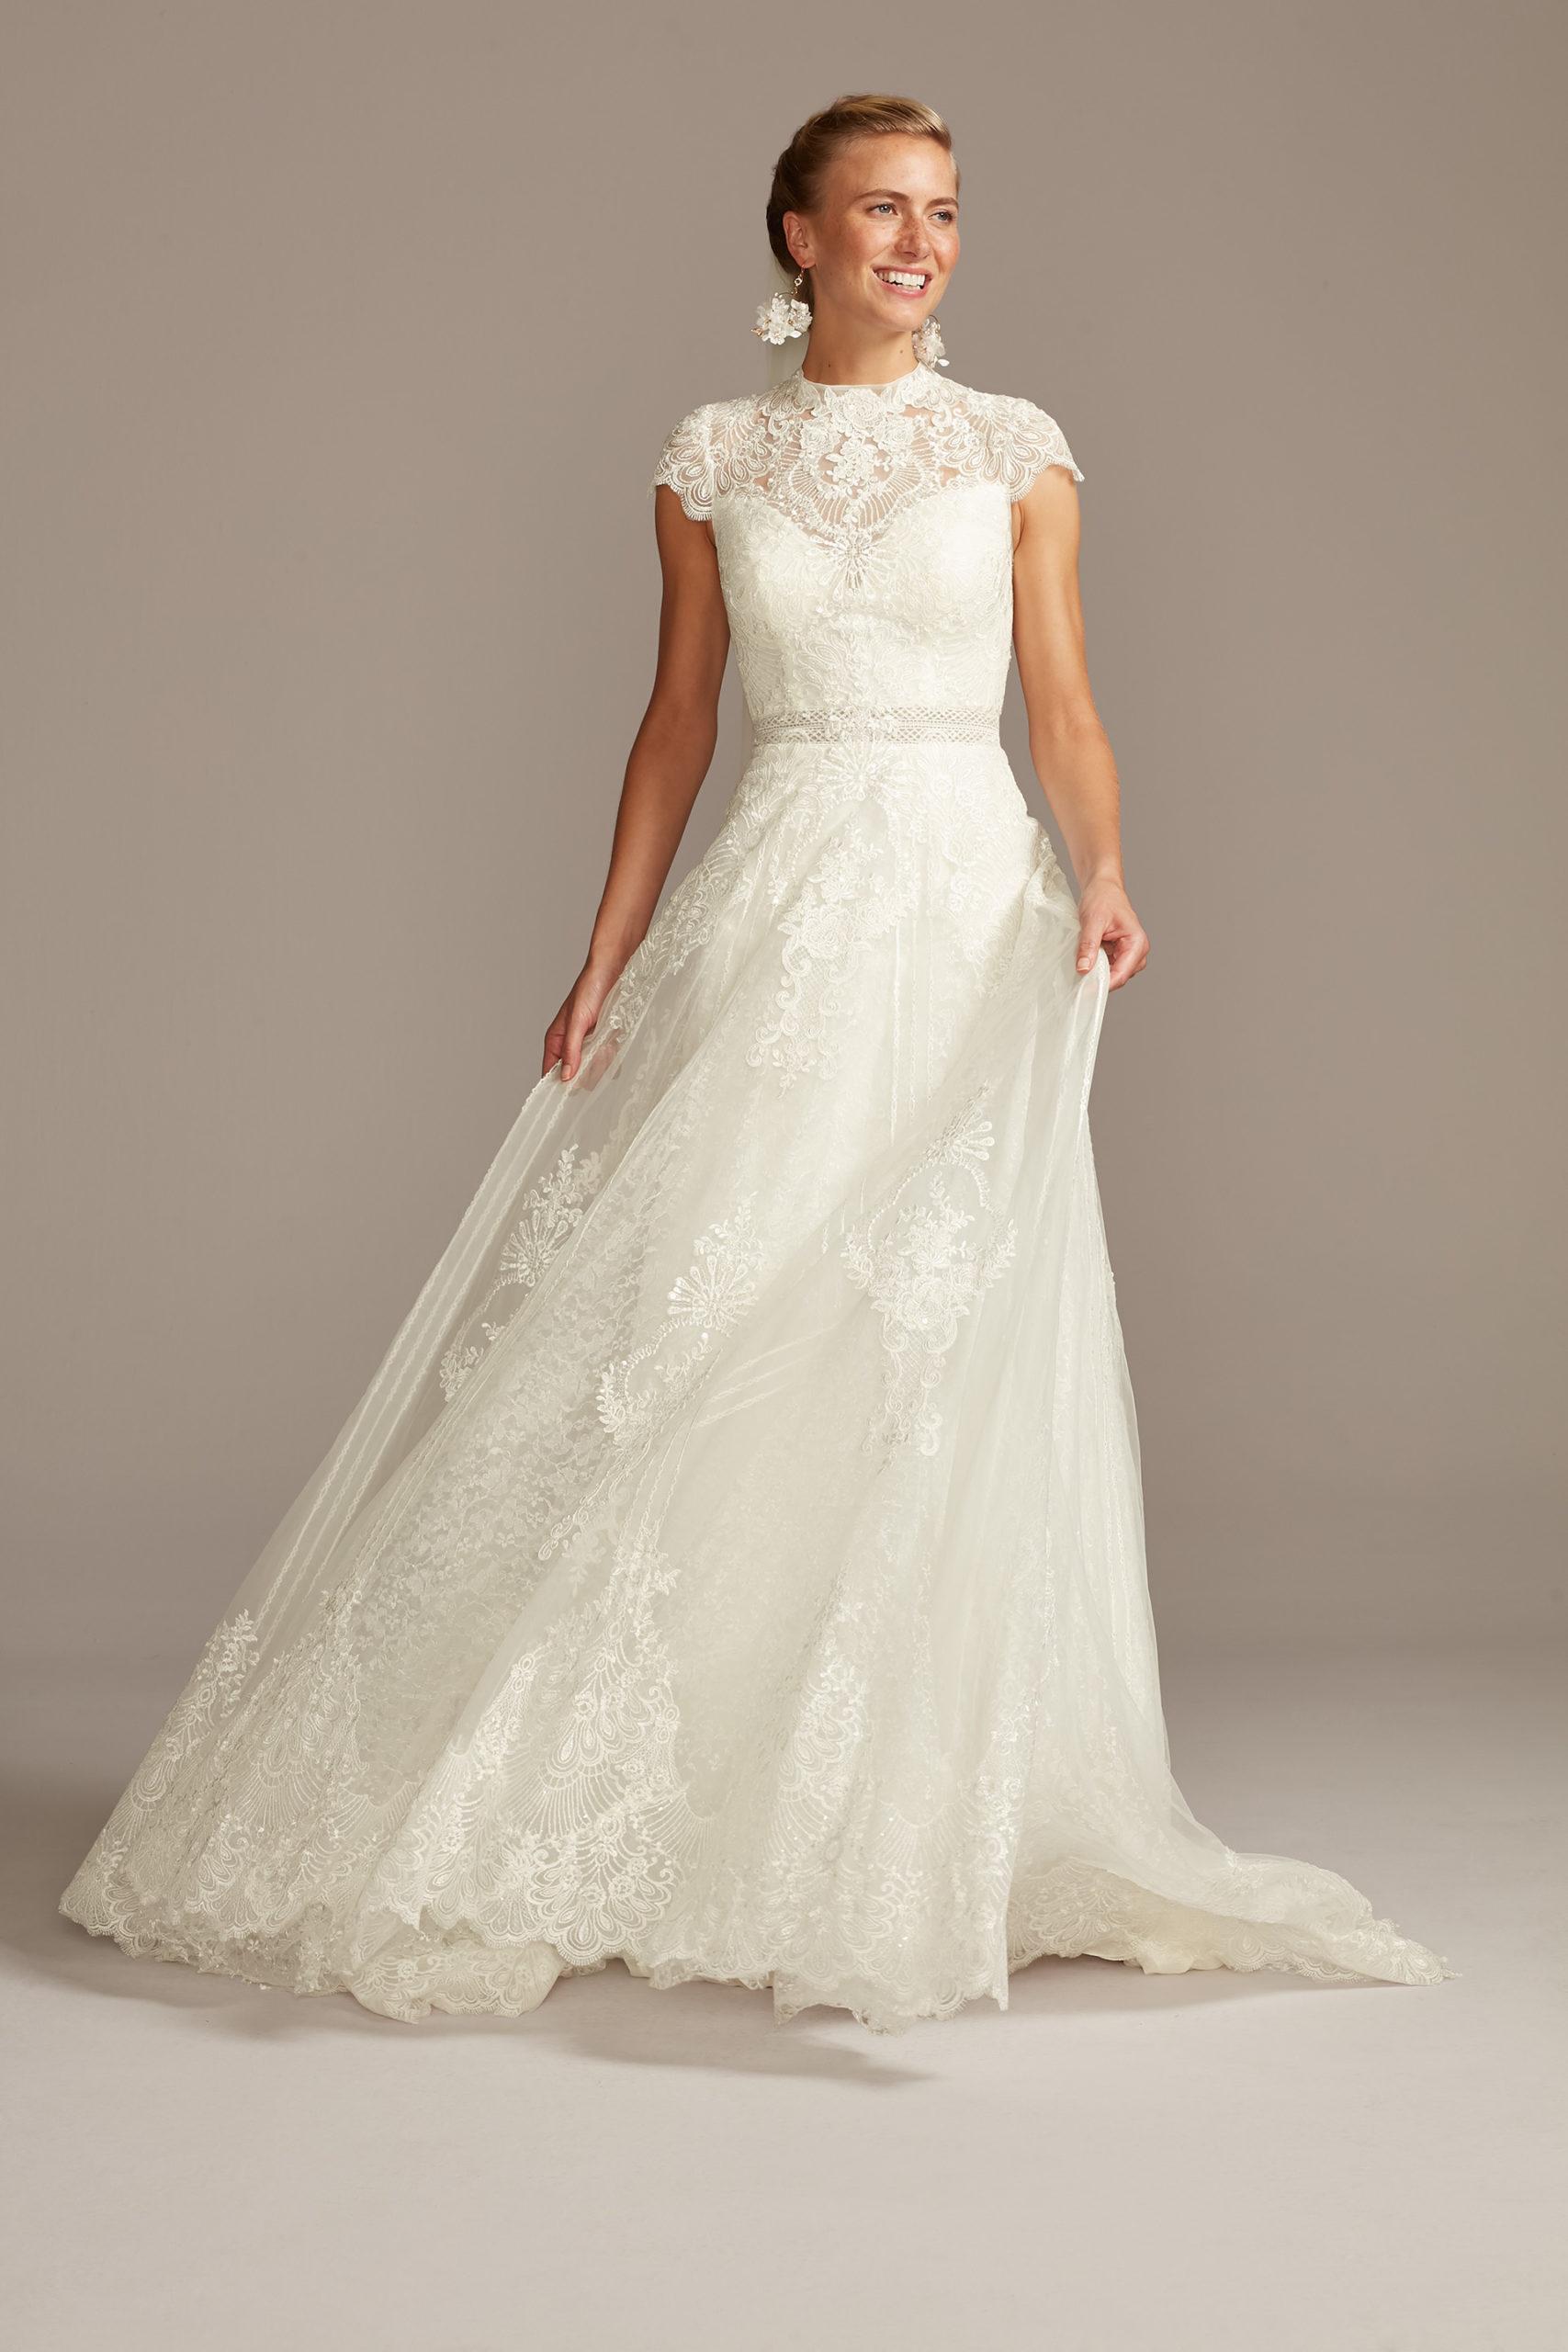 Bride wearing lace wedding dress with mock neck neckline